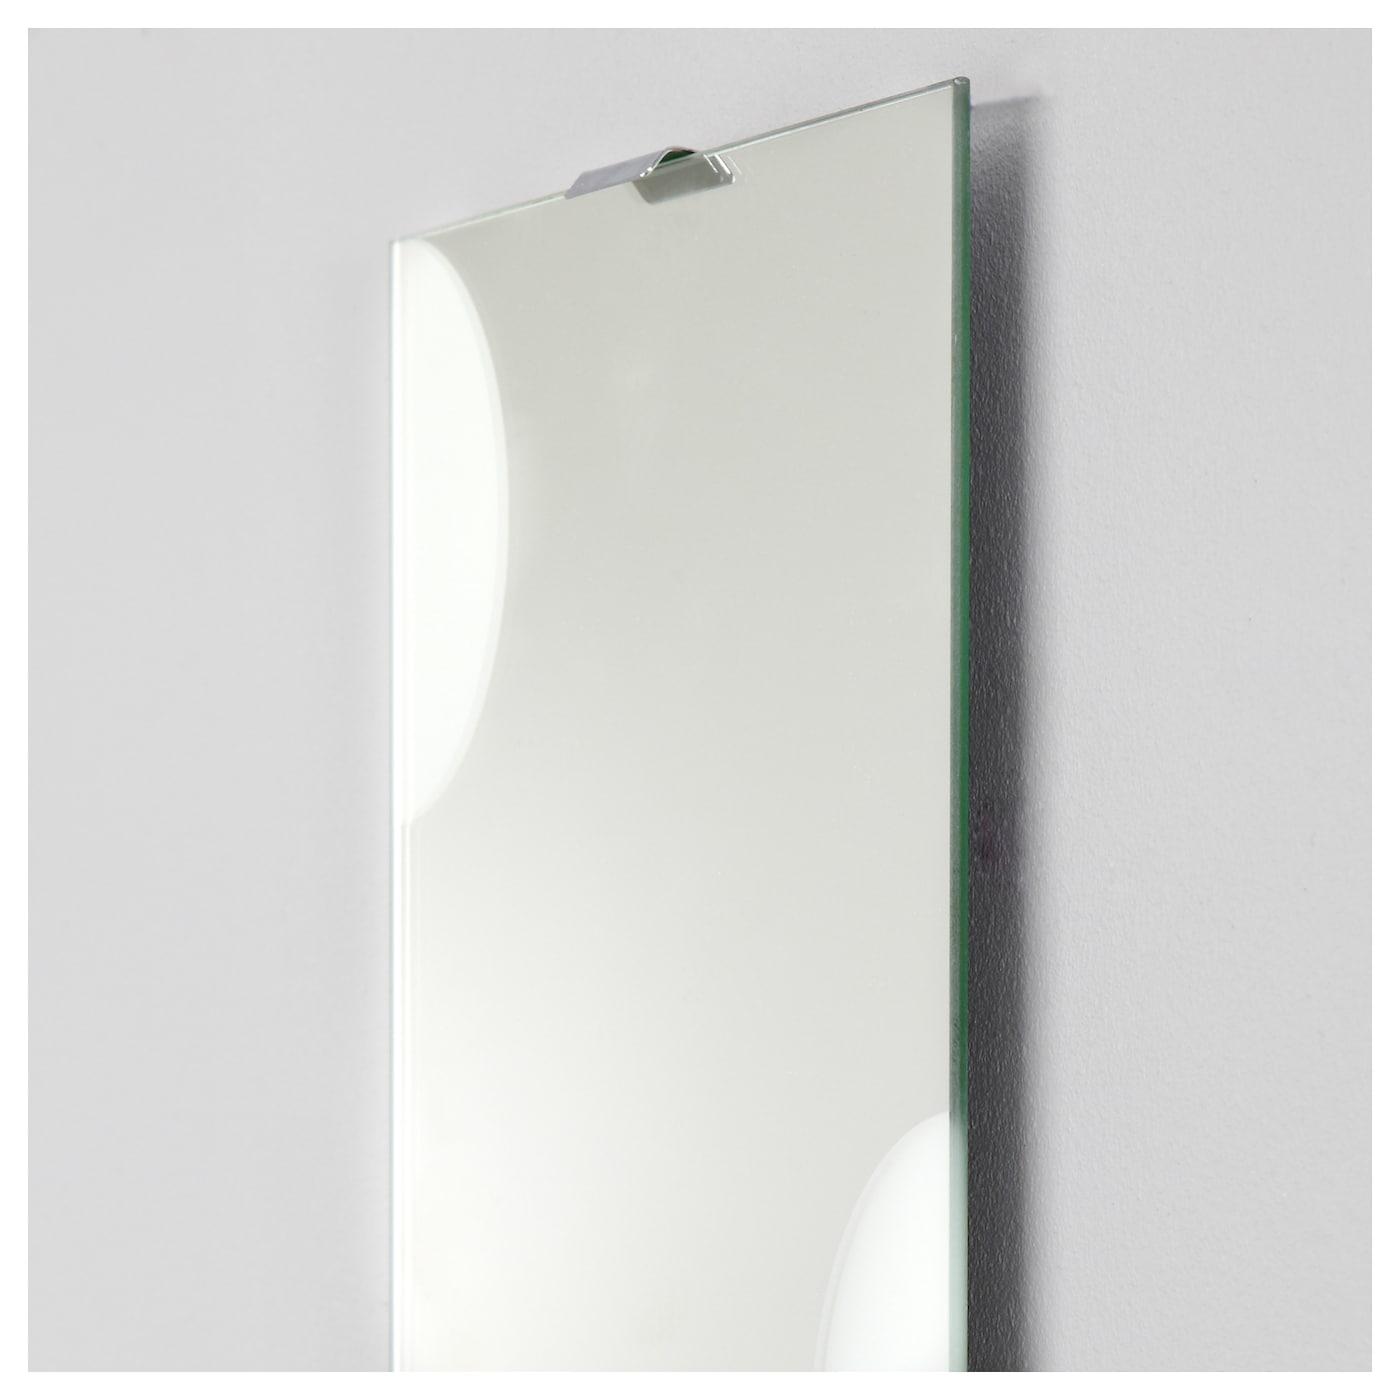 lundamo spiegel 20x120 cm ikea. Black Bedroom Furniture Sets. Home Design Ideas